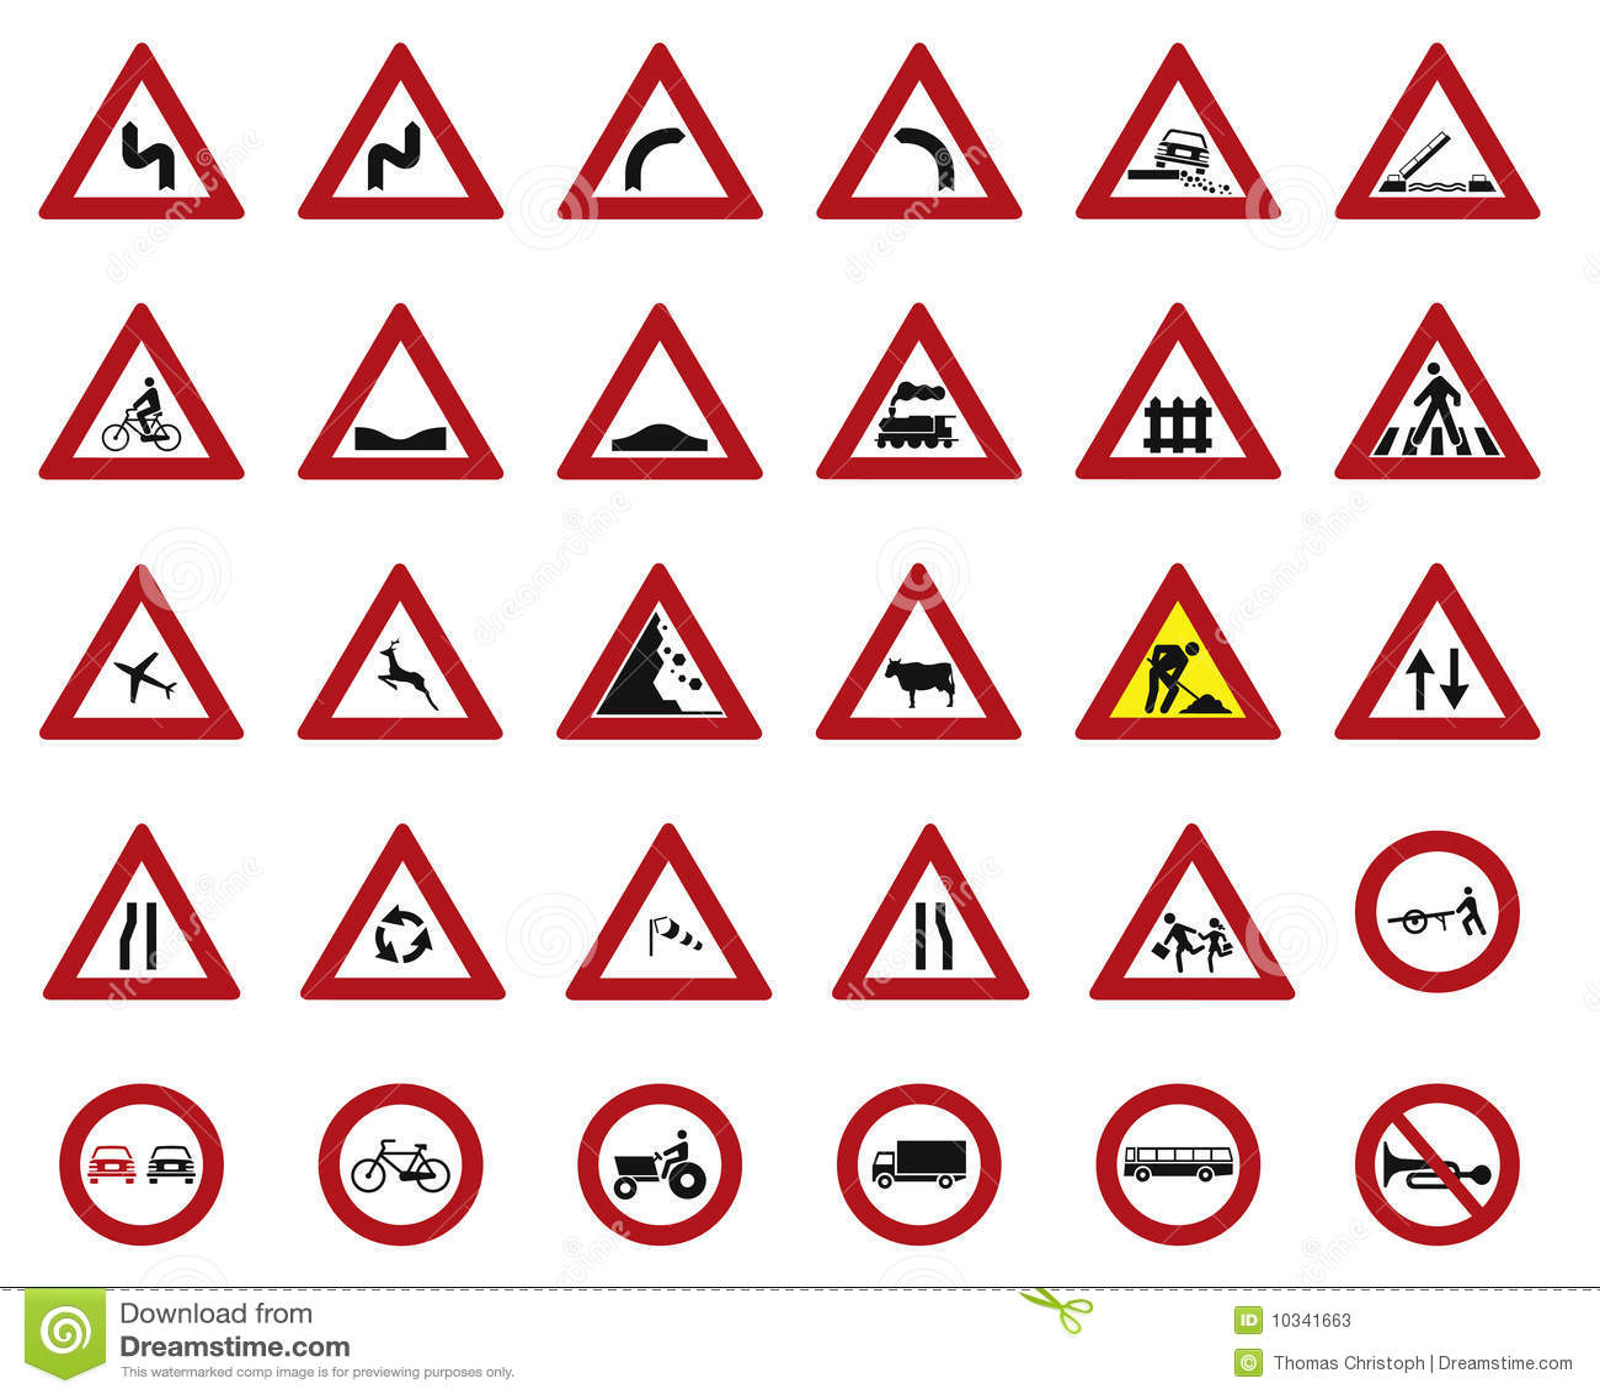 funny warning signs symbols